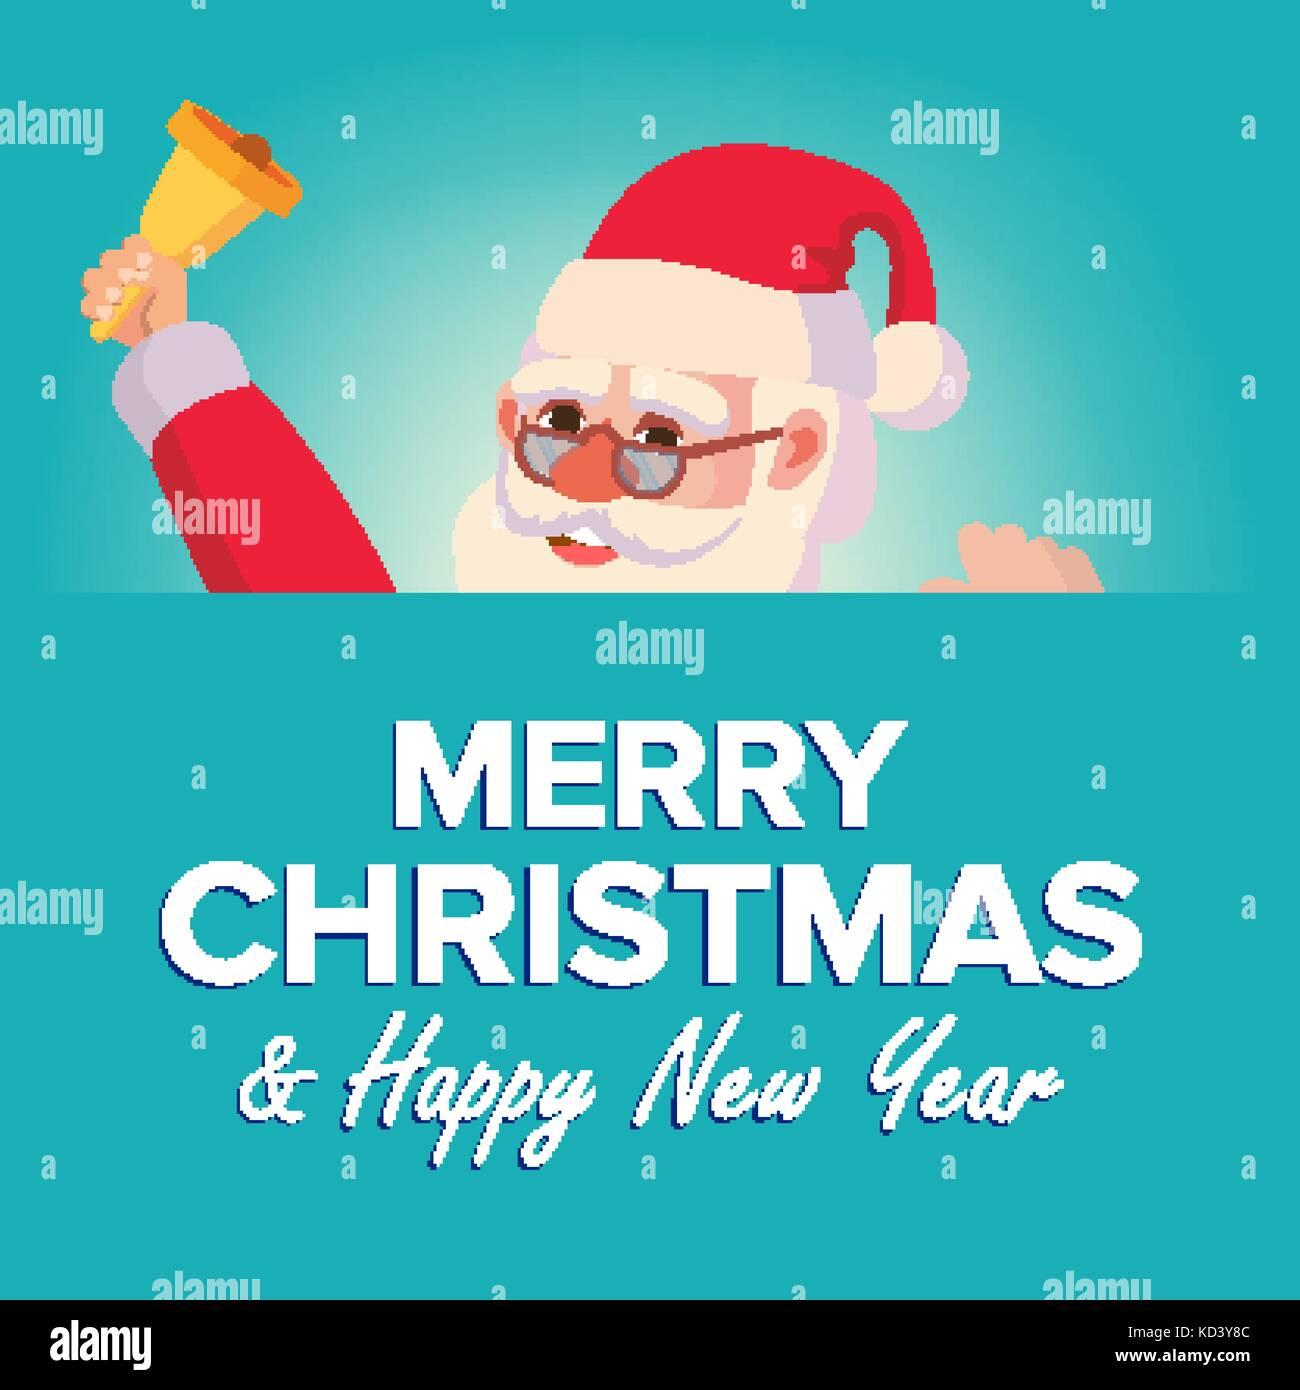 Merry Christmas Santa Claus Greeting Card Vector Poster Banner